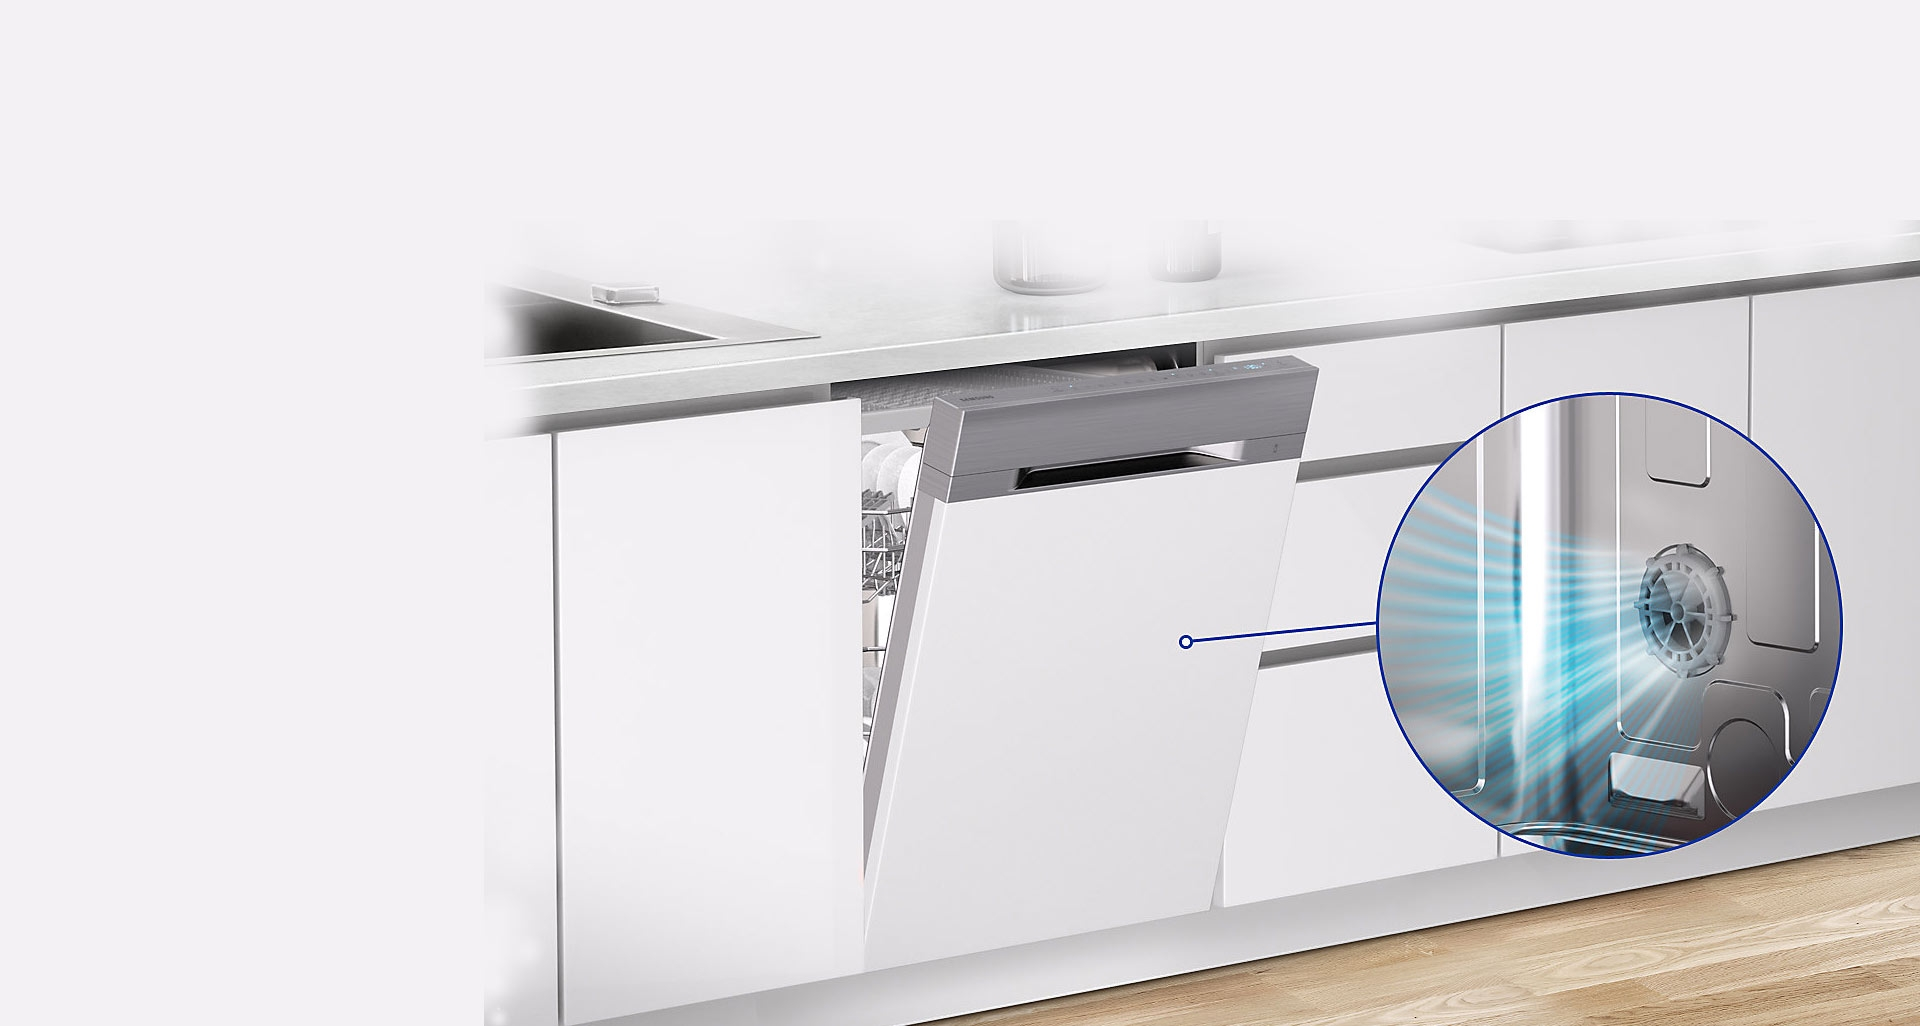 خشک کن خودکار ماشین ظرفشویی WaterWall سامسونگ